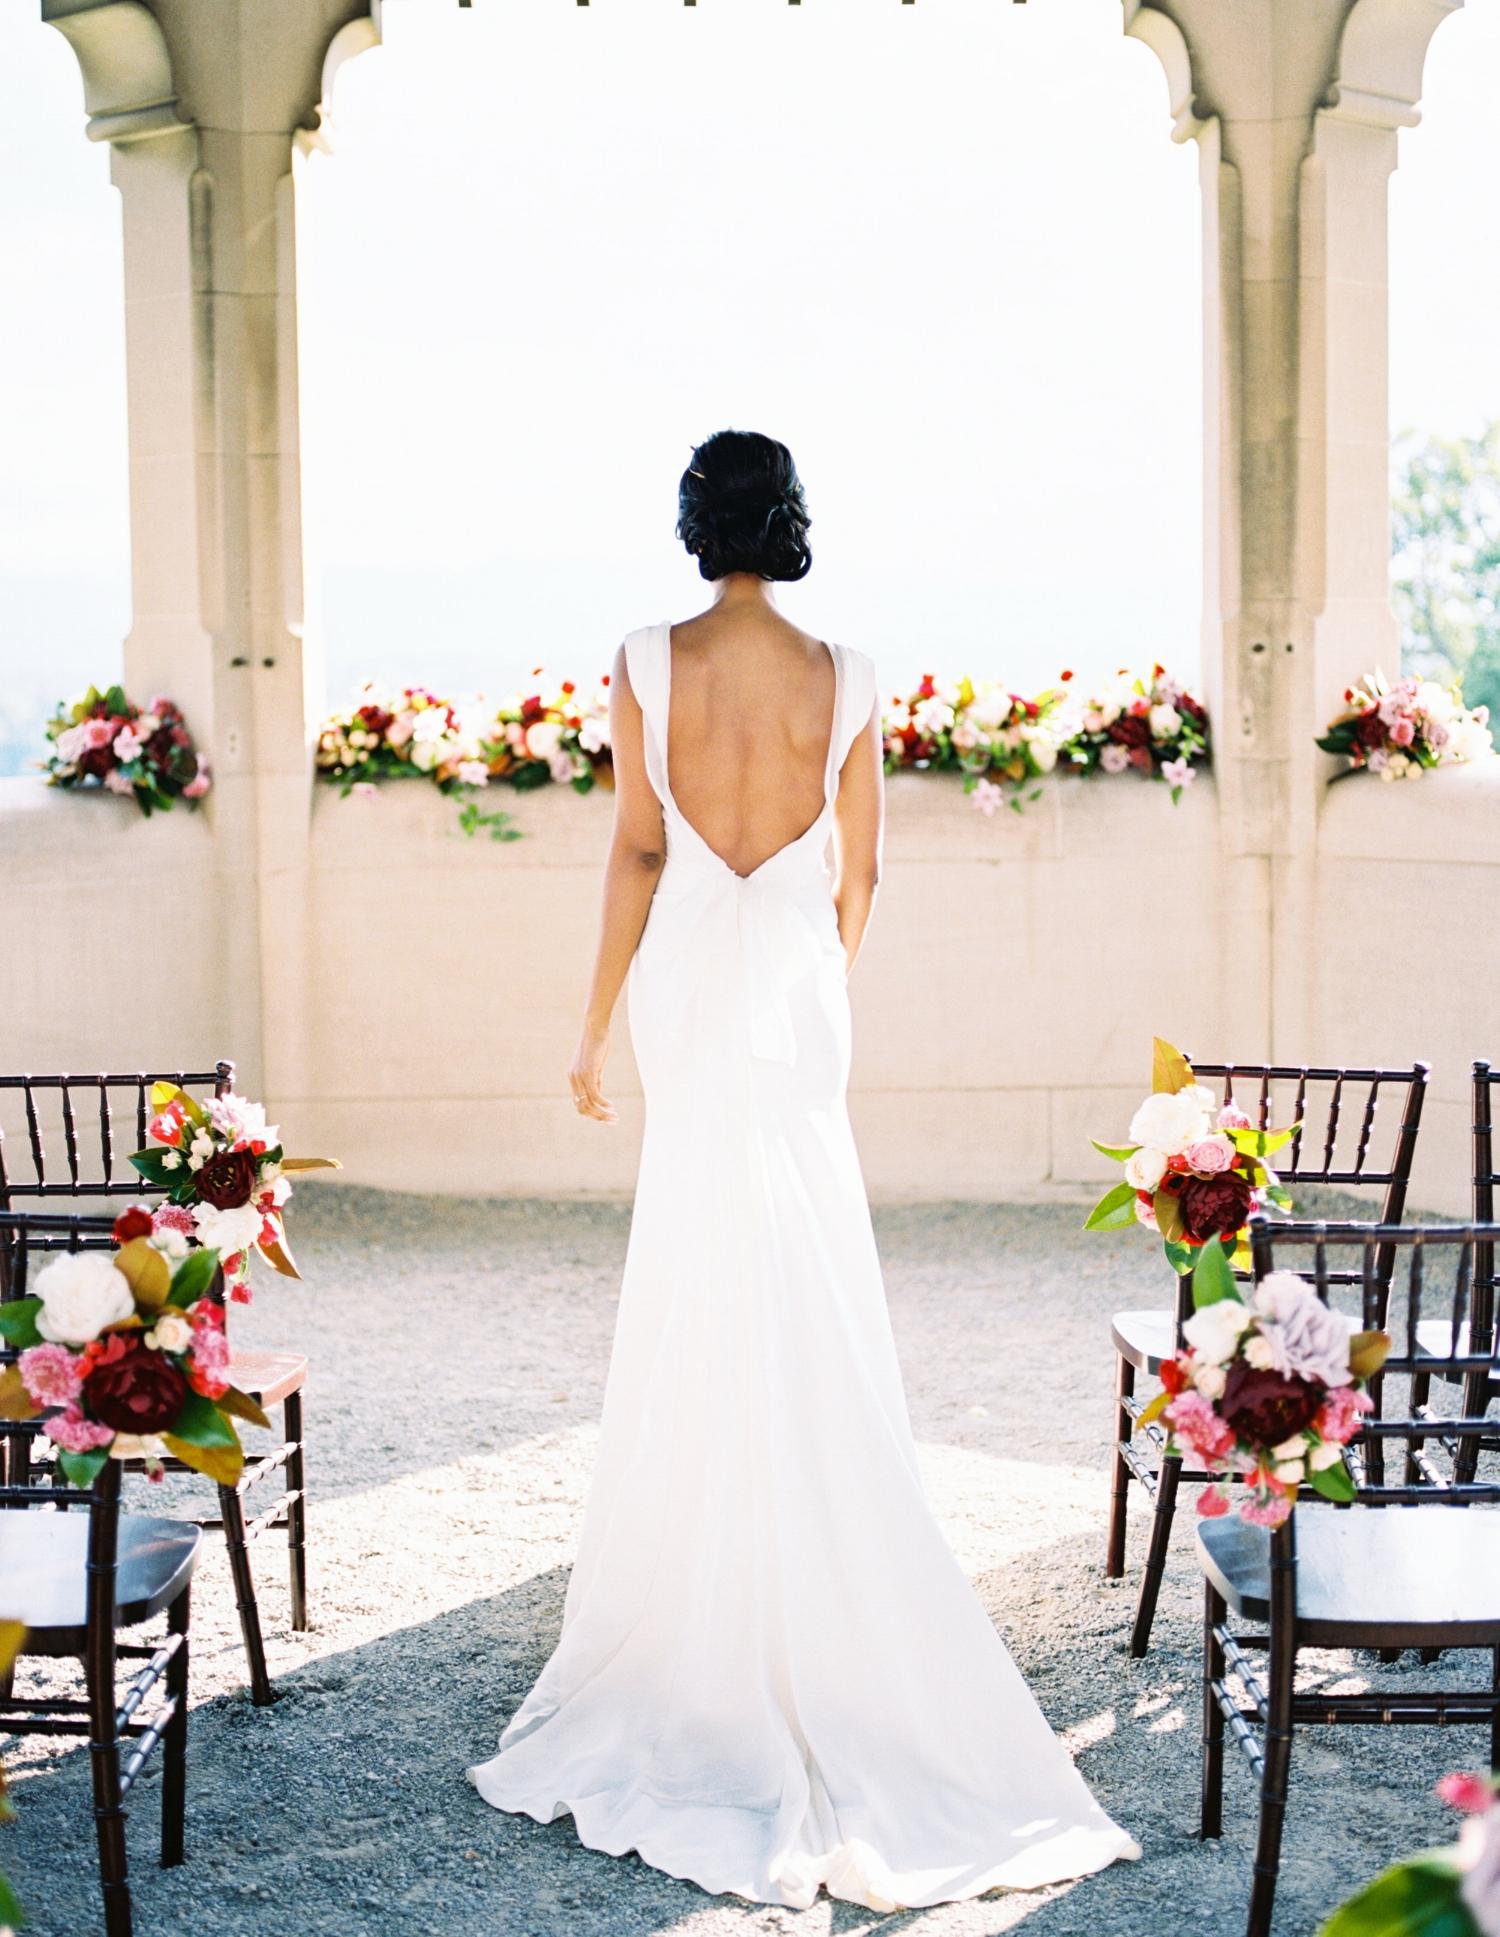 Wedding Ceremony at Biltmore Estate